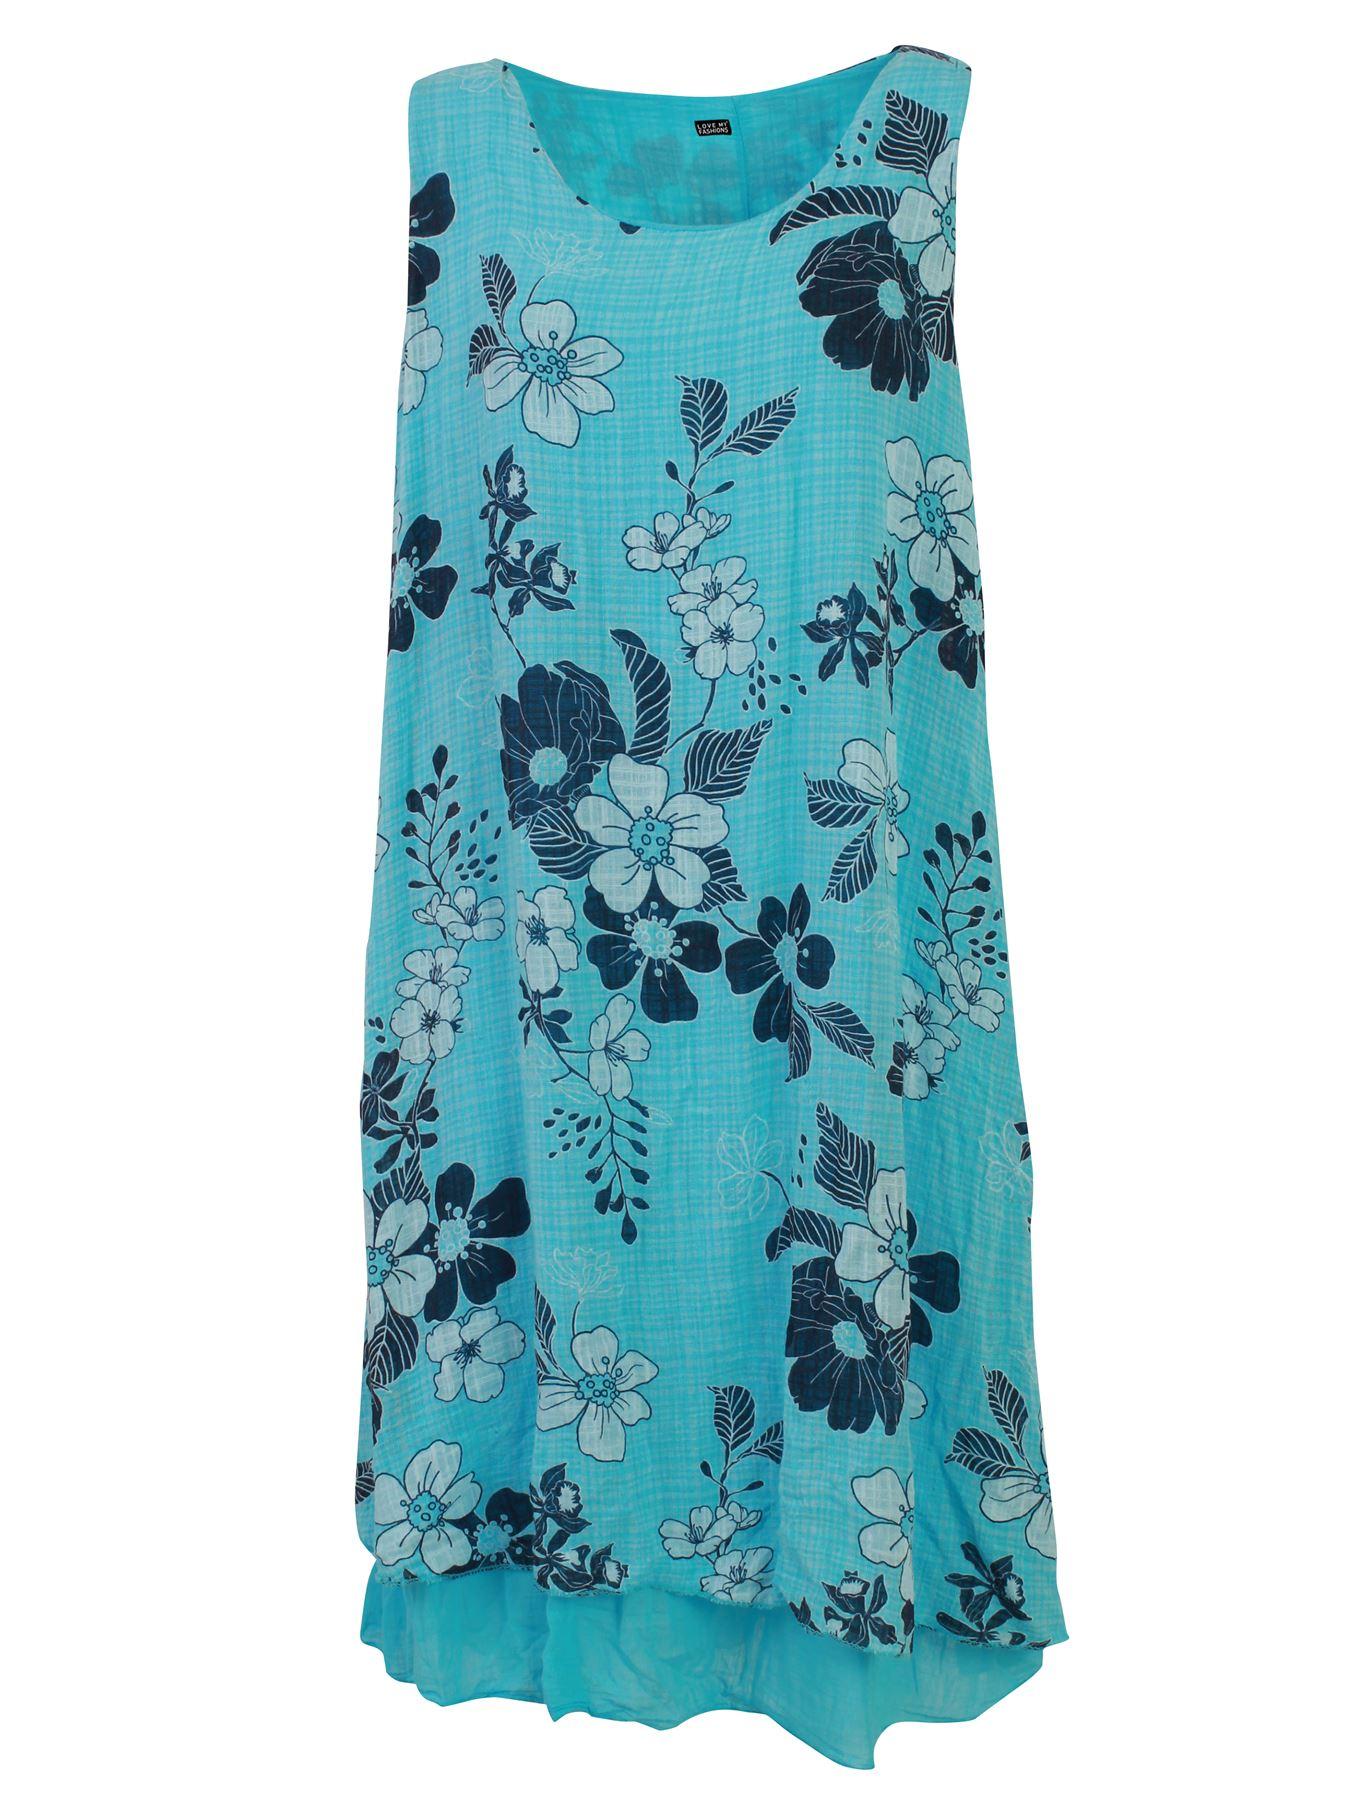 Womens-Floral-Print-Italian-Fashion-Lagenlook-Summer-Cotton-Crew-Neck-Dress thumbnail 26